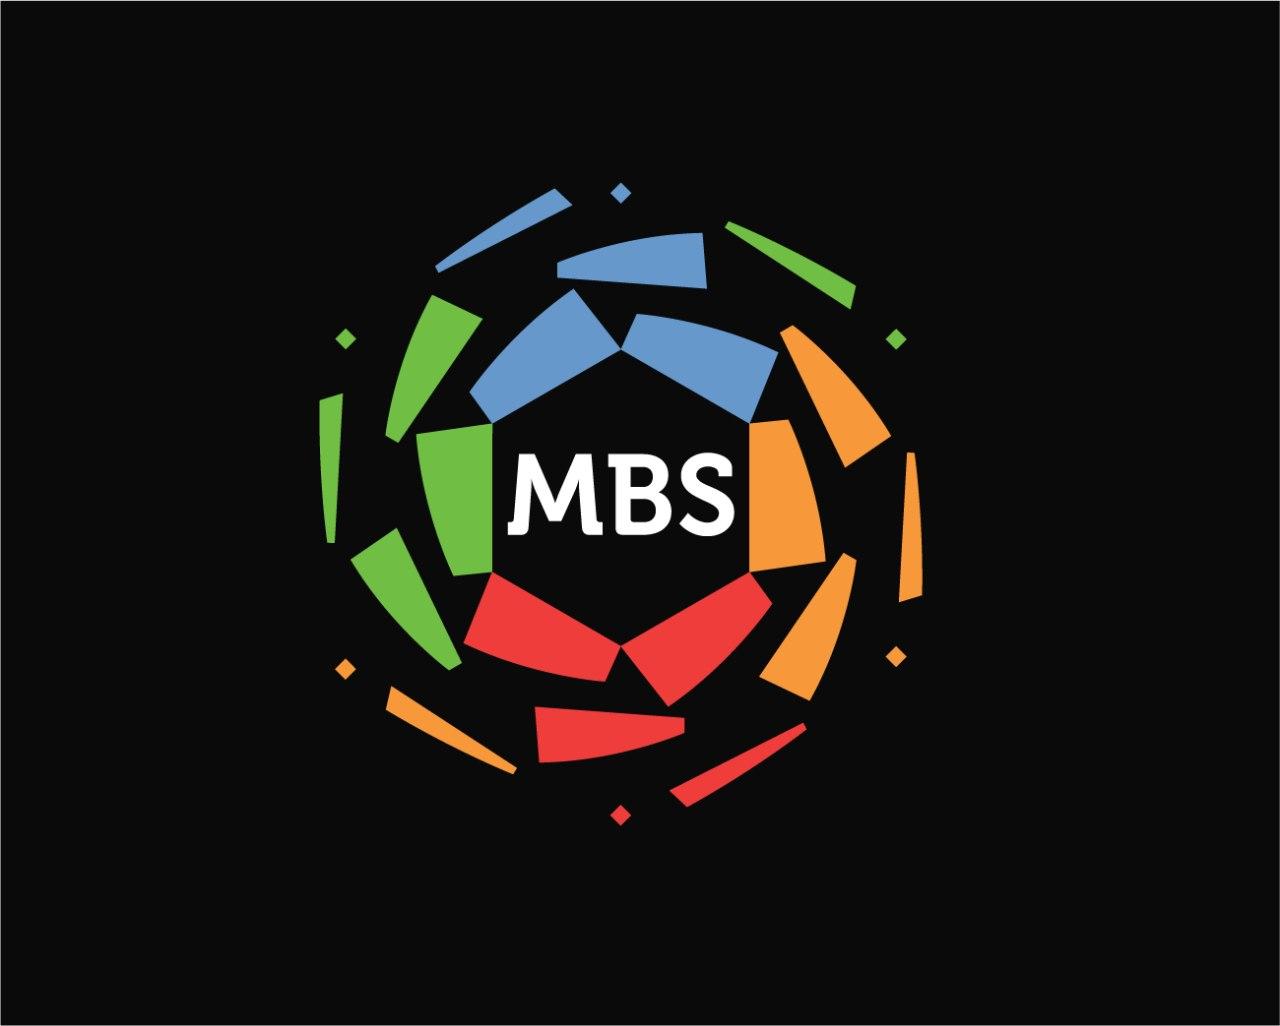 جدول الدوري السعودي 2021 الدور الثاني مباريات الدوري السعودي الدور الثاني موسوعة